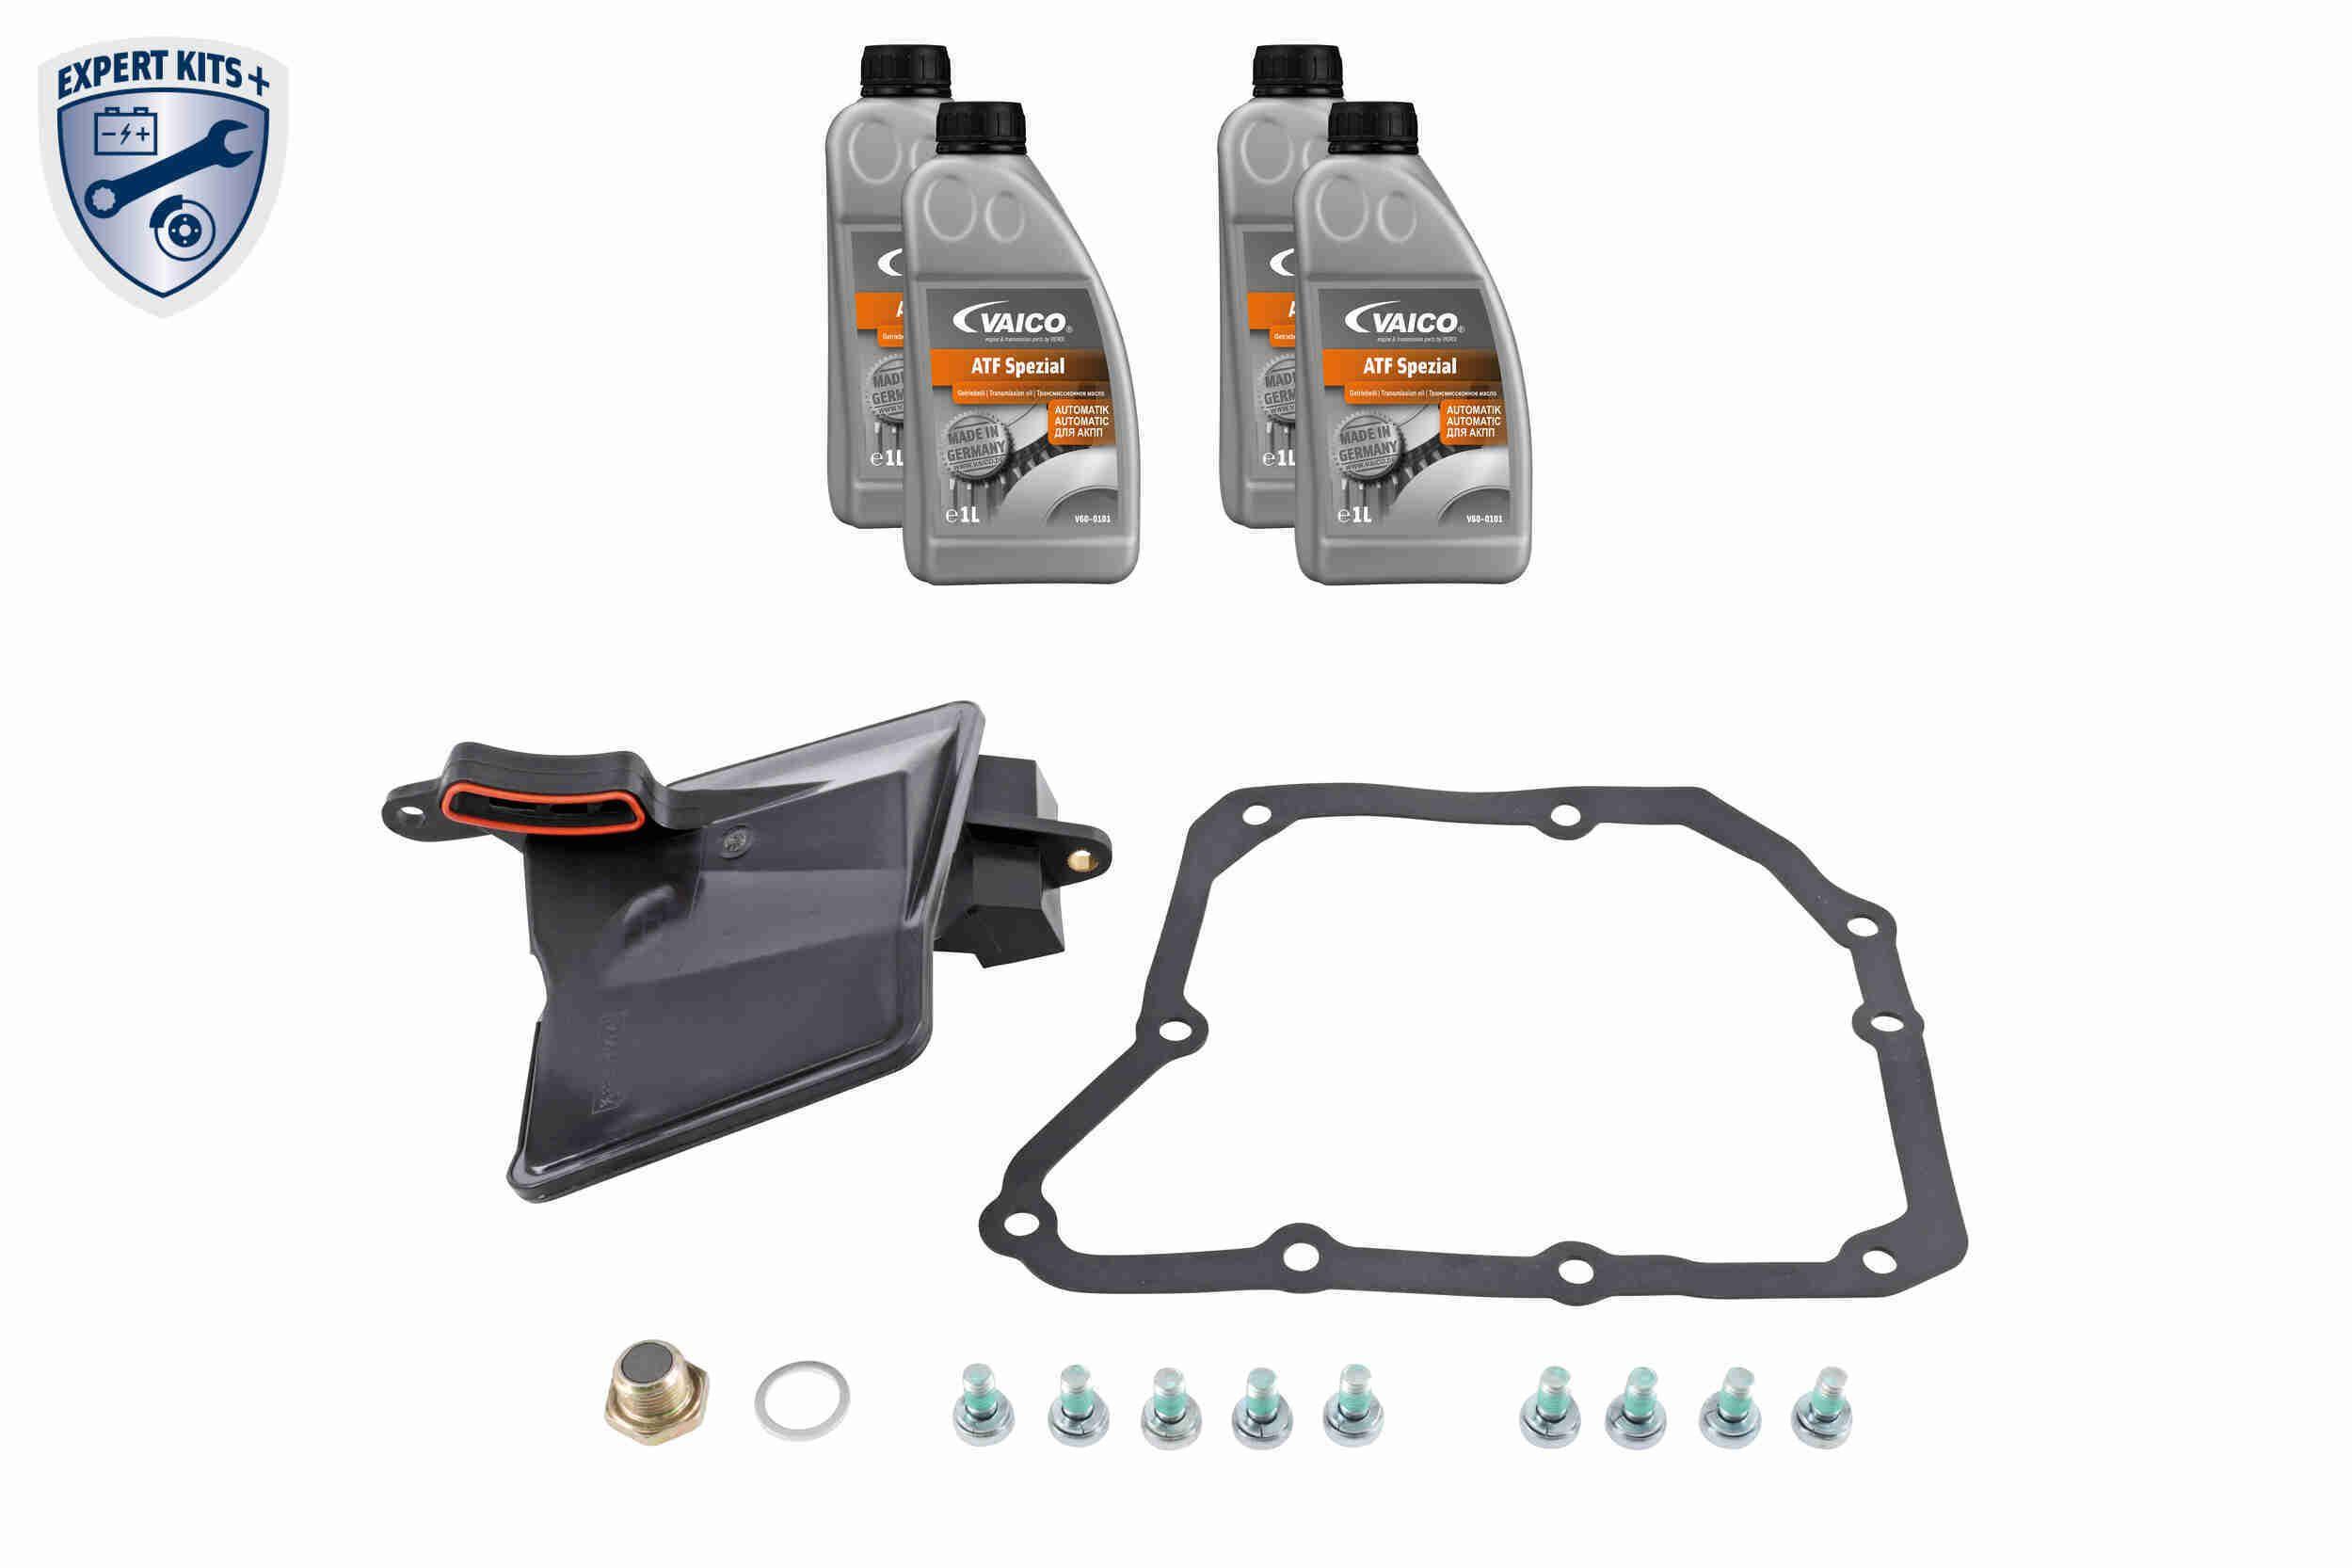 OPEL OMEGA 2001 Teilesatz, Ölwechsel-Automatikgetriebe - Original VAICO V40-1604